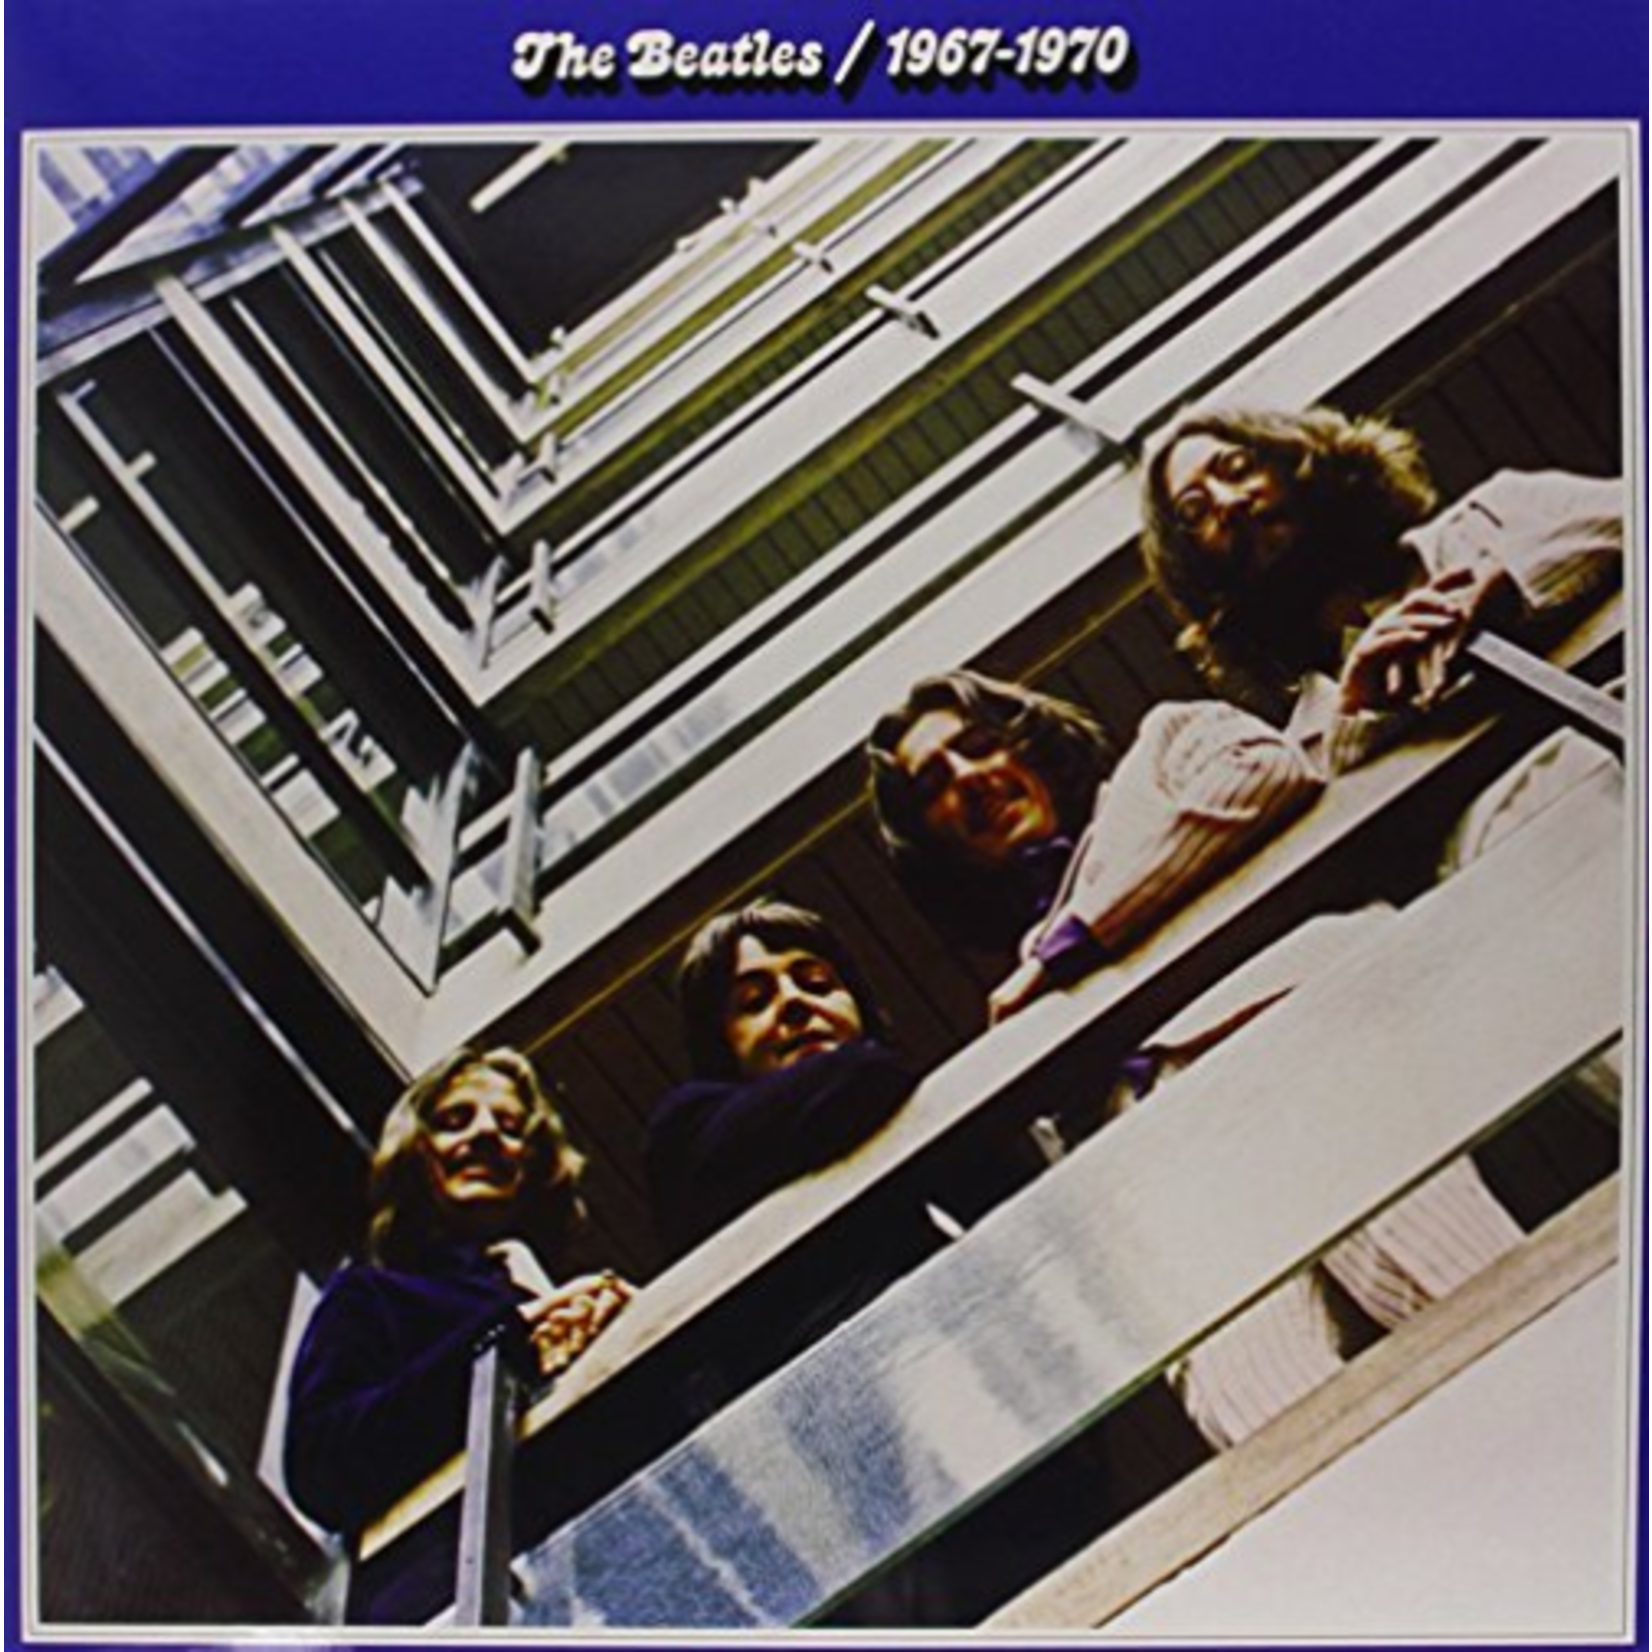 THE BEATLES 1967 - 1970 (BLUE)